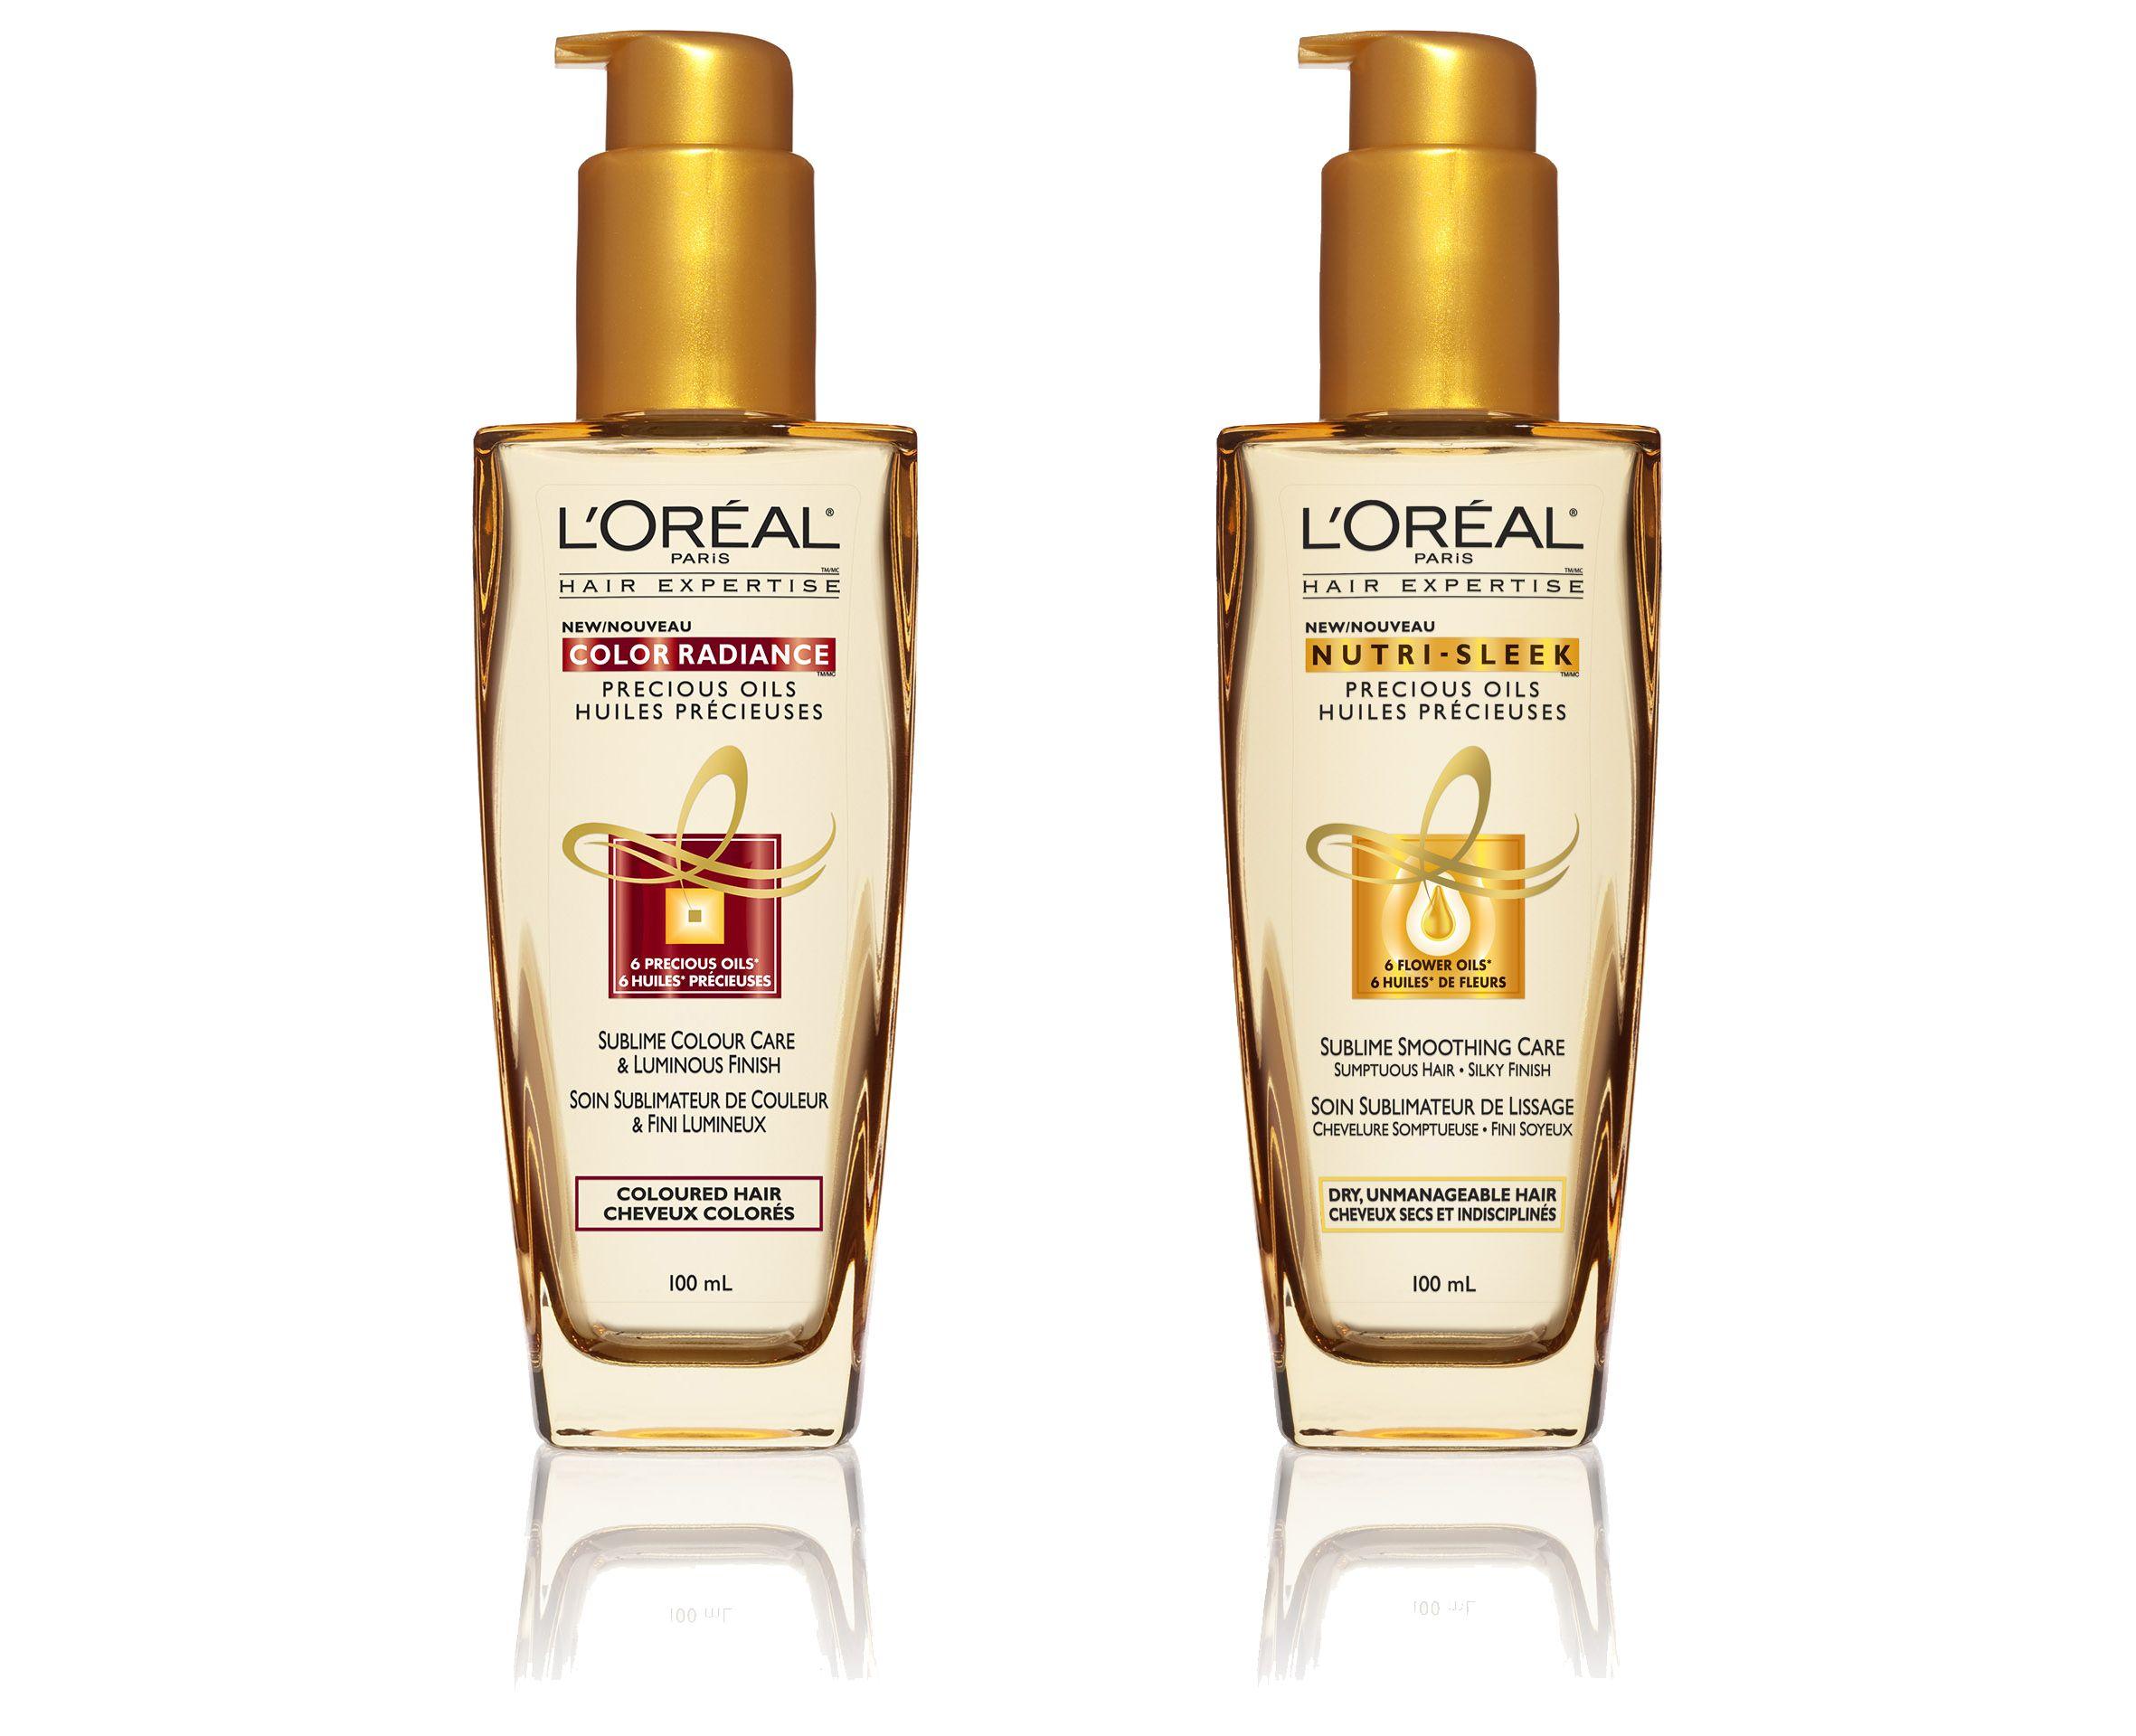 I Love This Stuff Preciousoils Smooth Shiny Hair Hair Care Shiny Hair